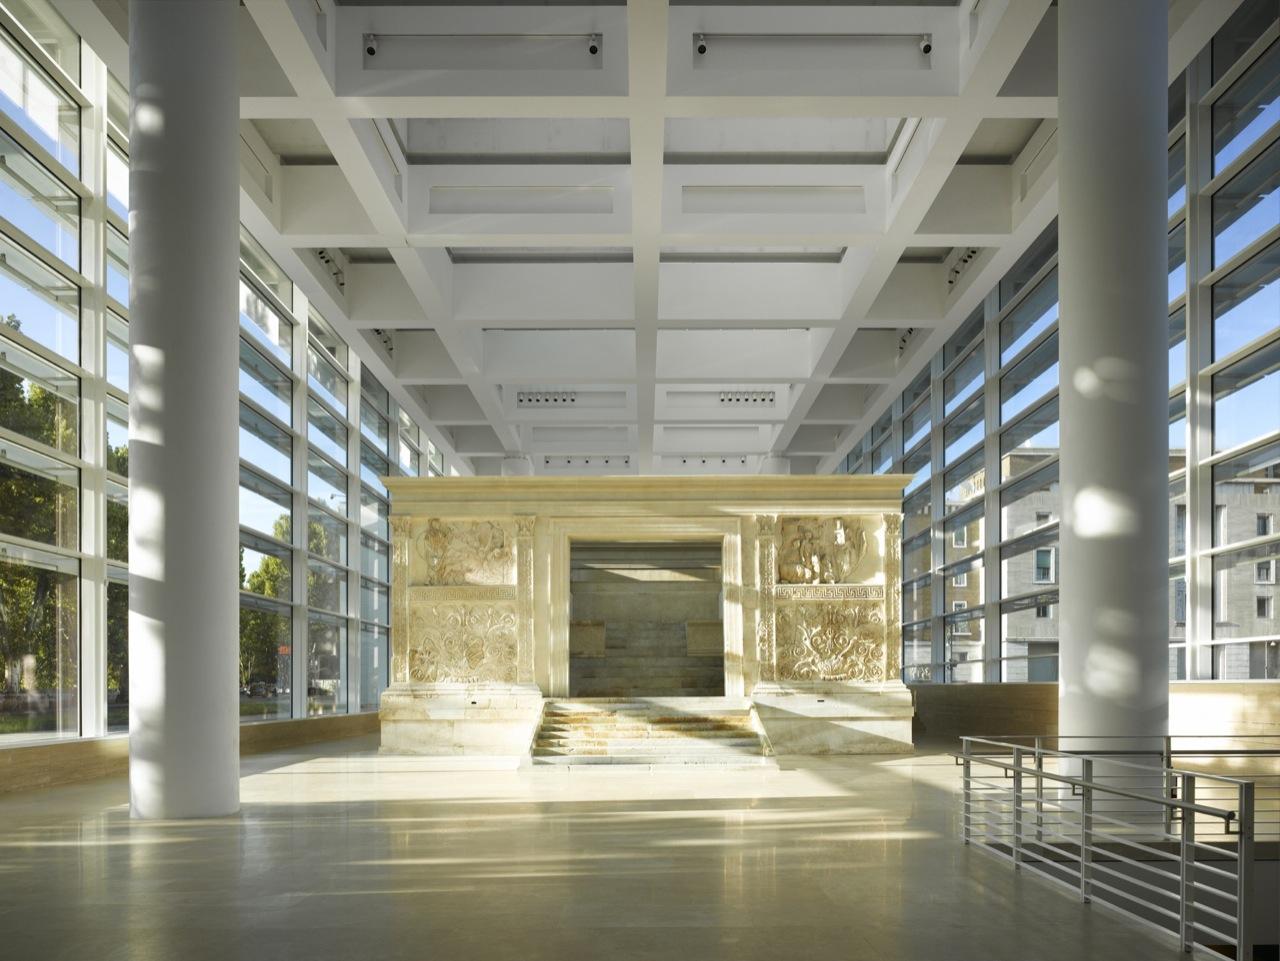 architecture as aesthetics ara pacis museum richard